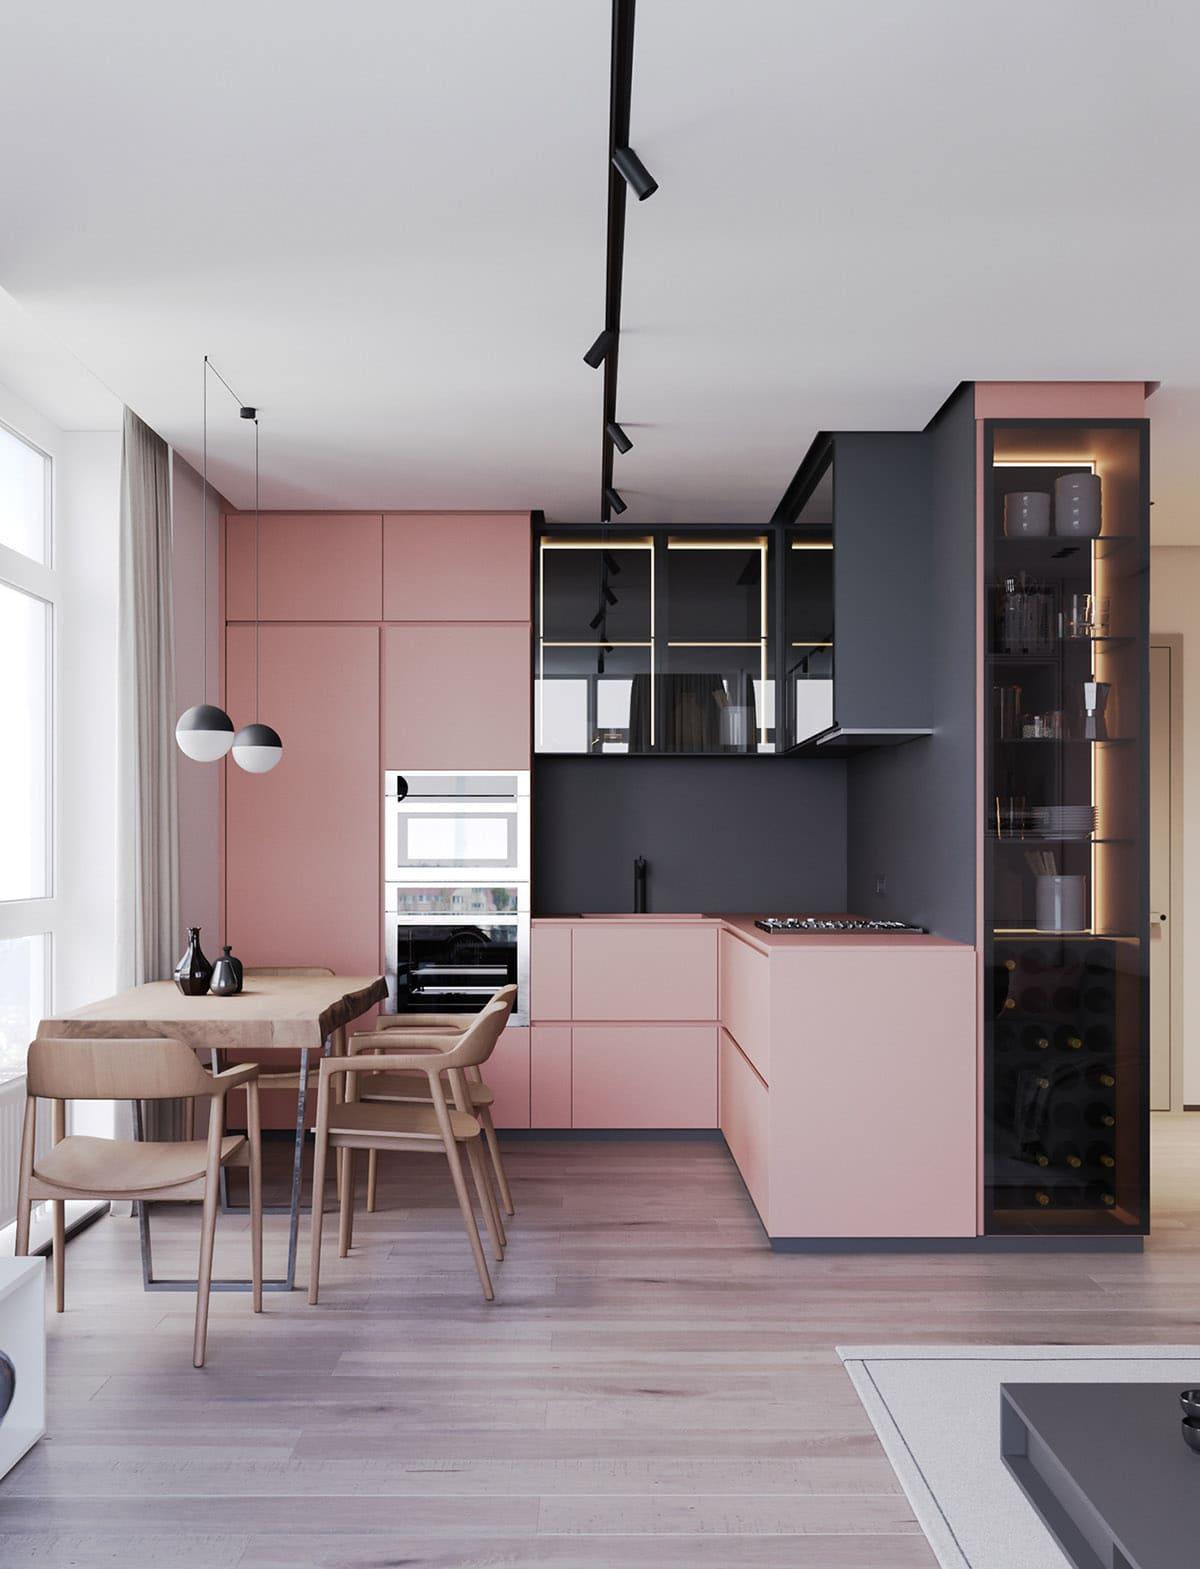 дизайн интерьера модной квартиры фото 38